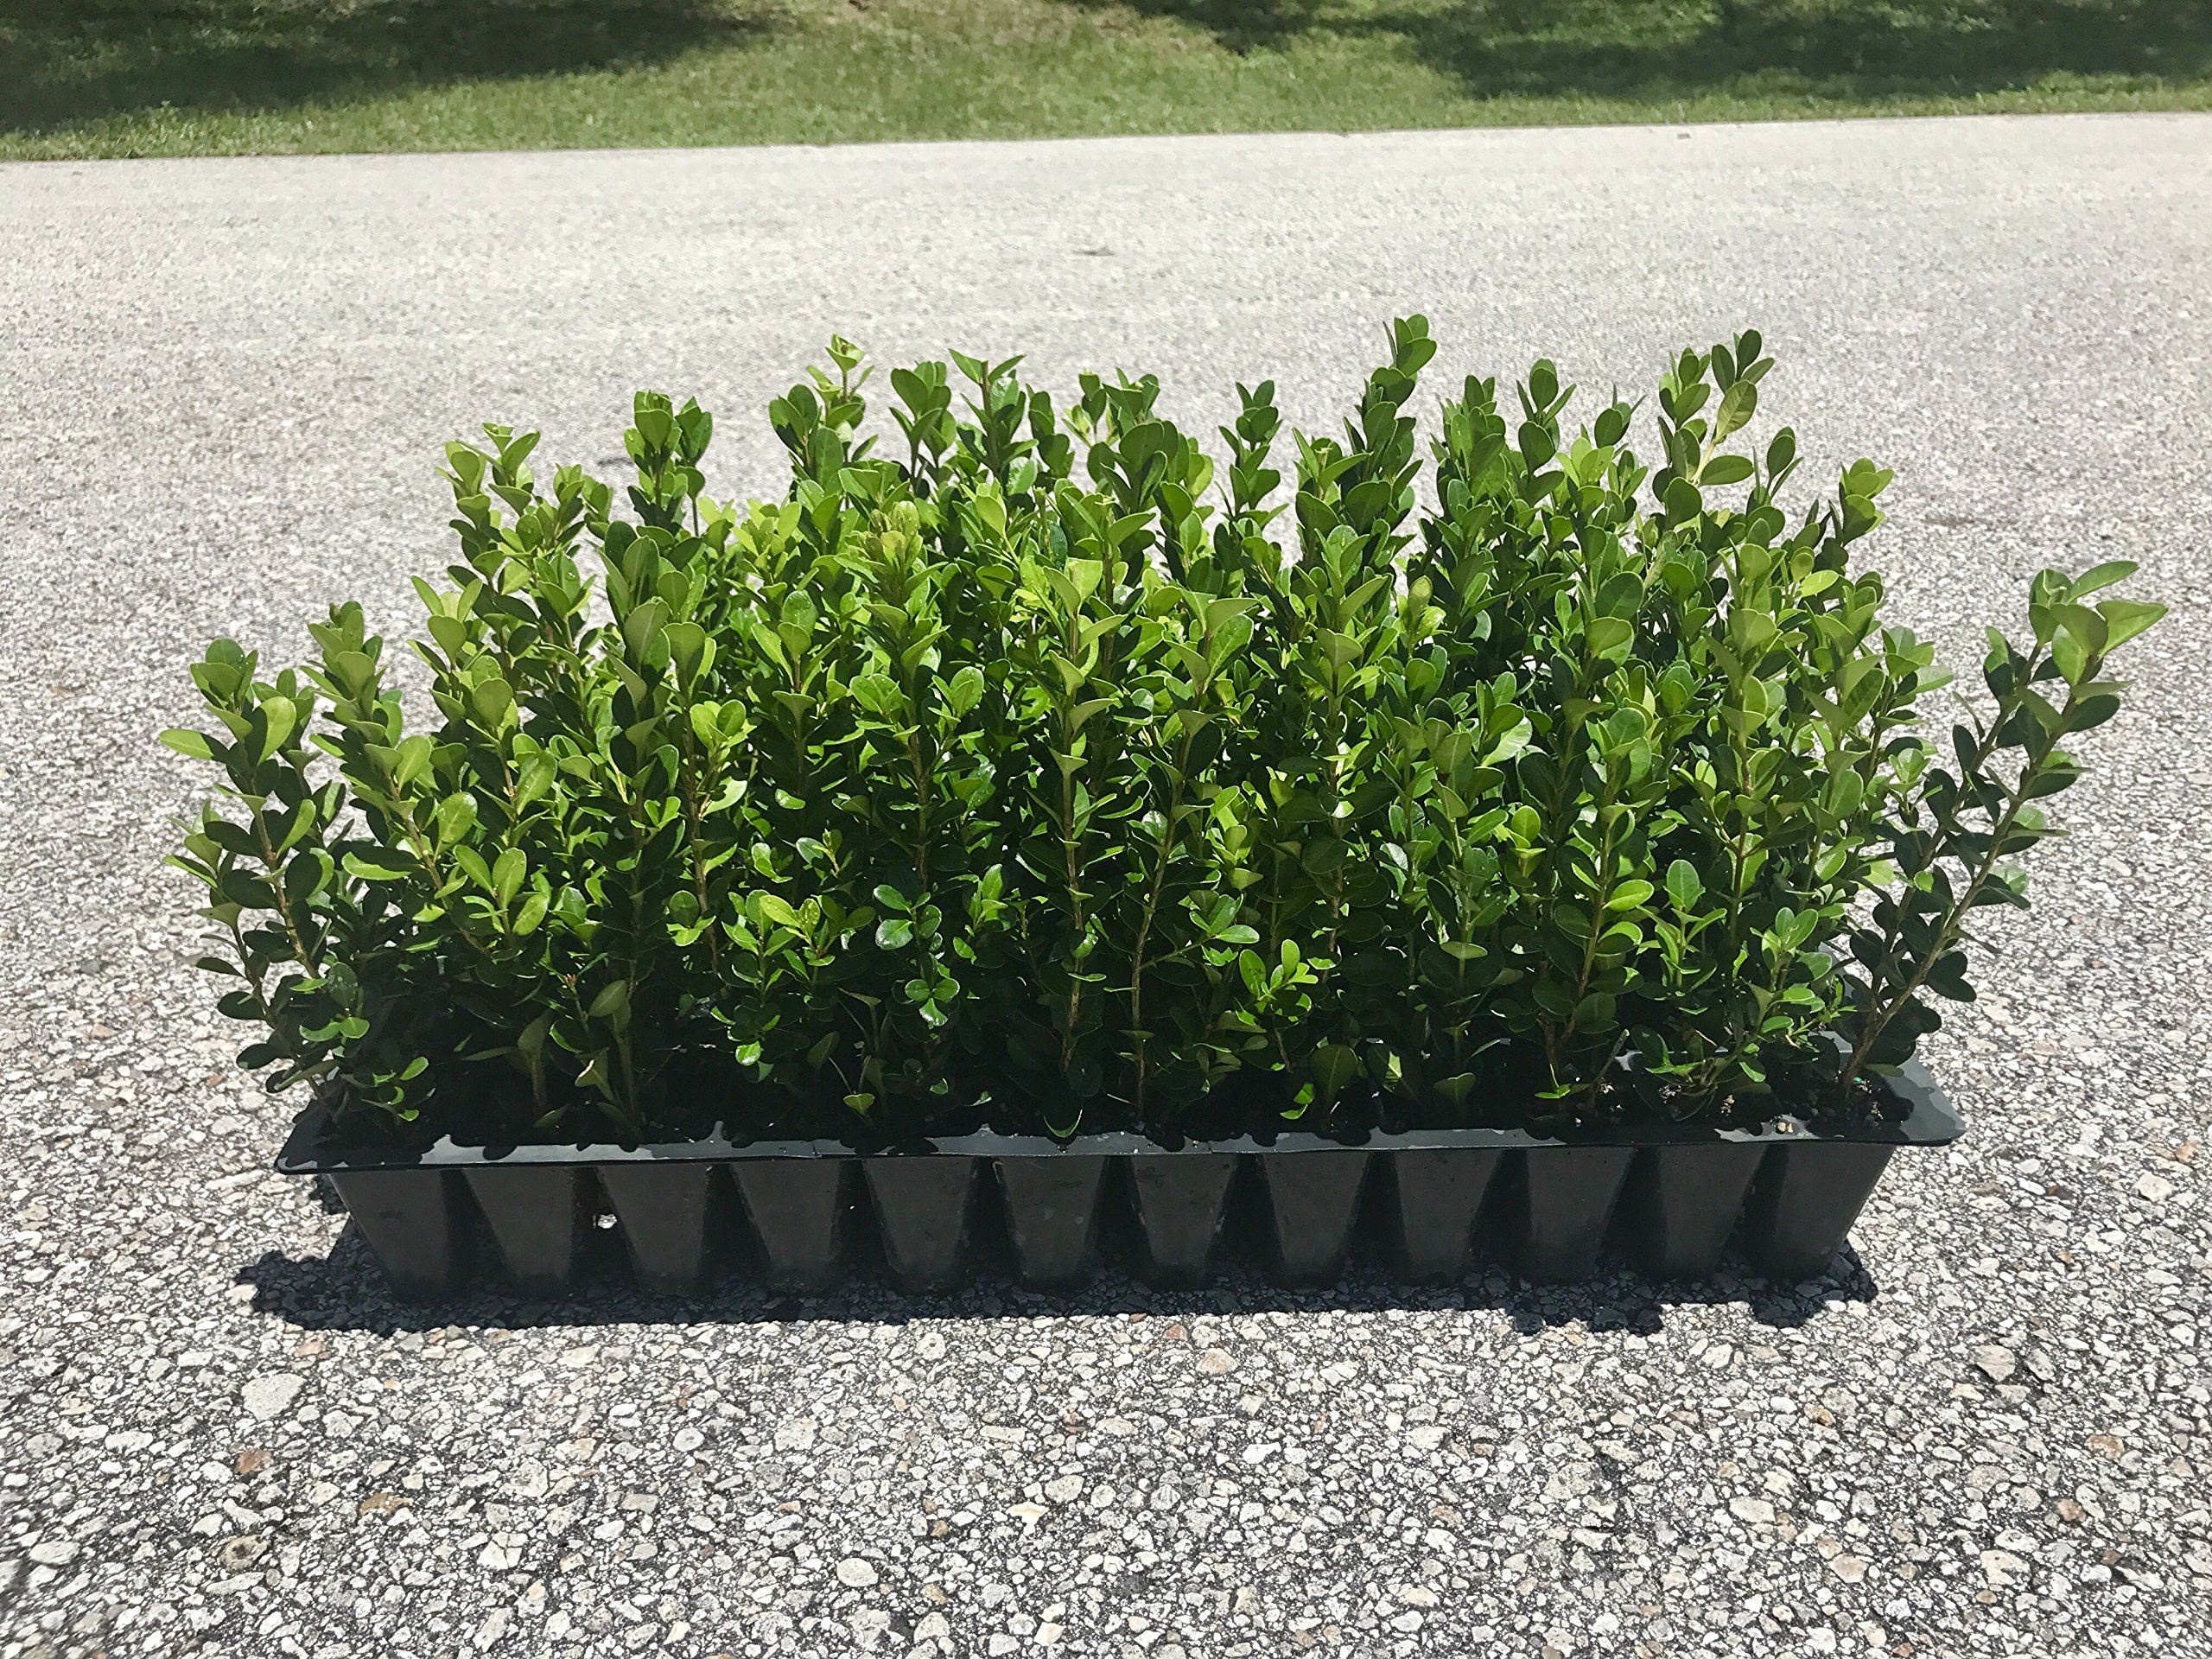 Winter Gem Boxwood Qty 15 Live Plants Evergreen Formal Hedge by Florida Foliage